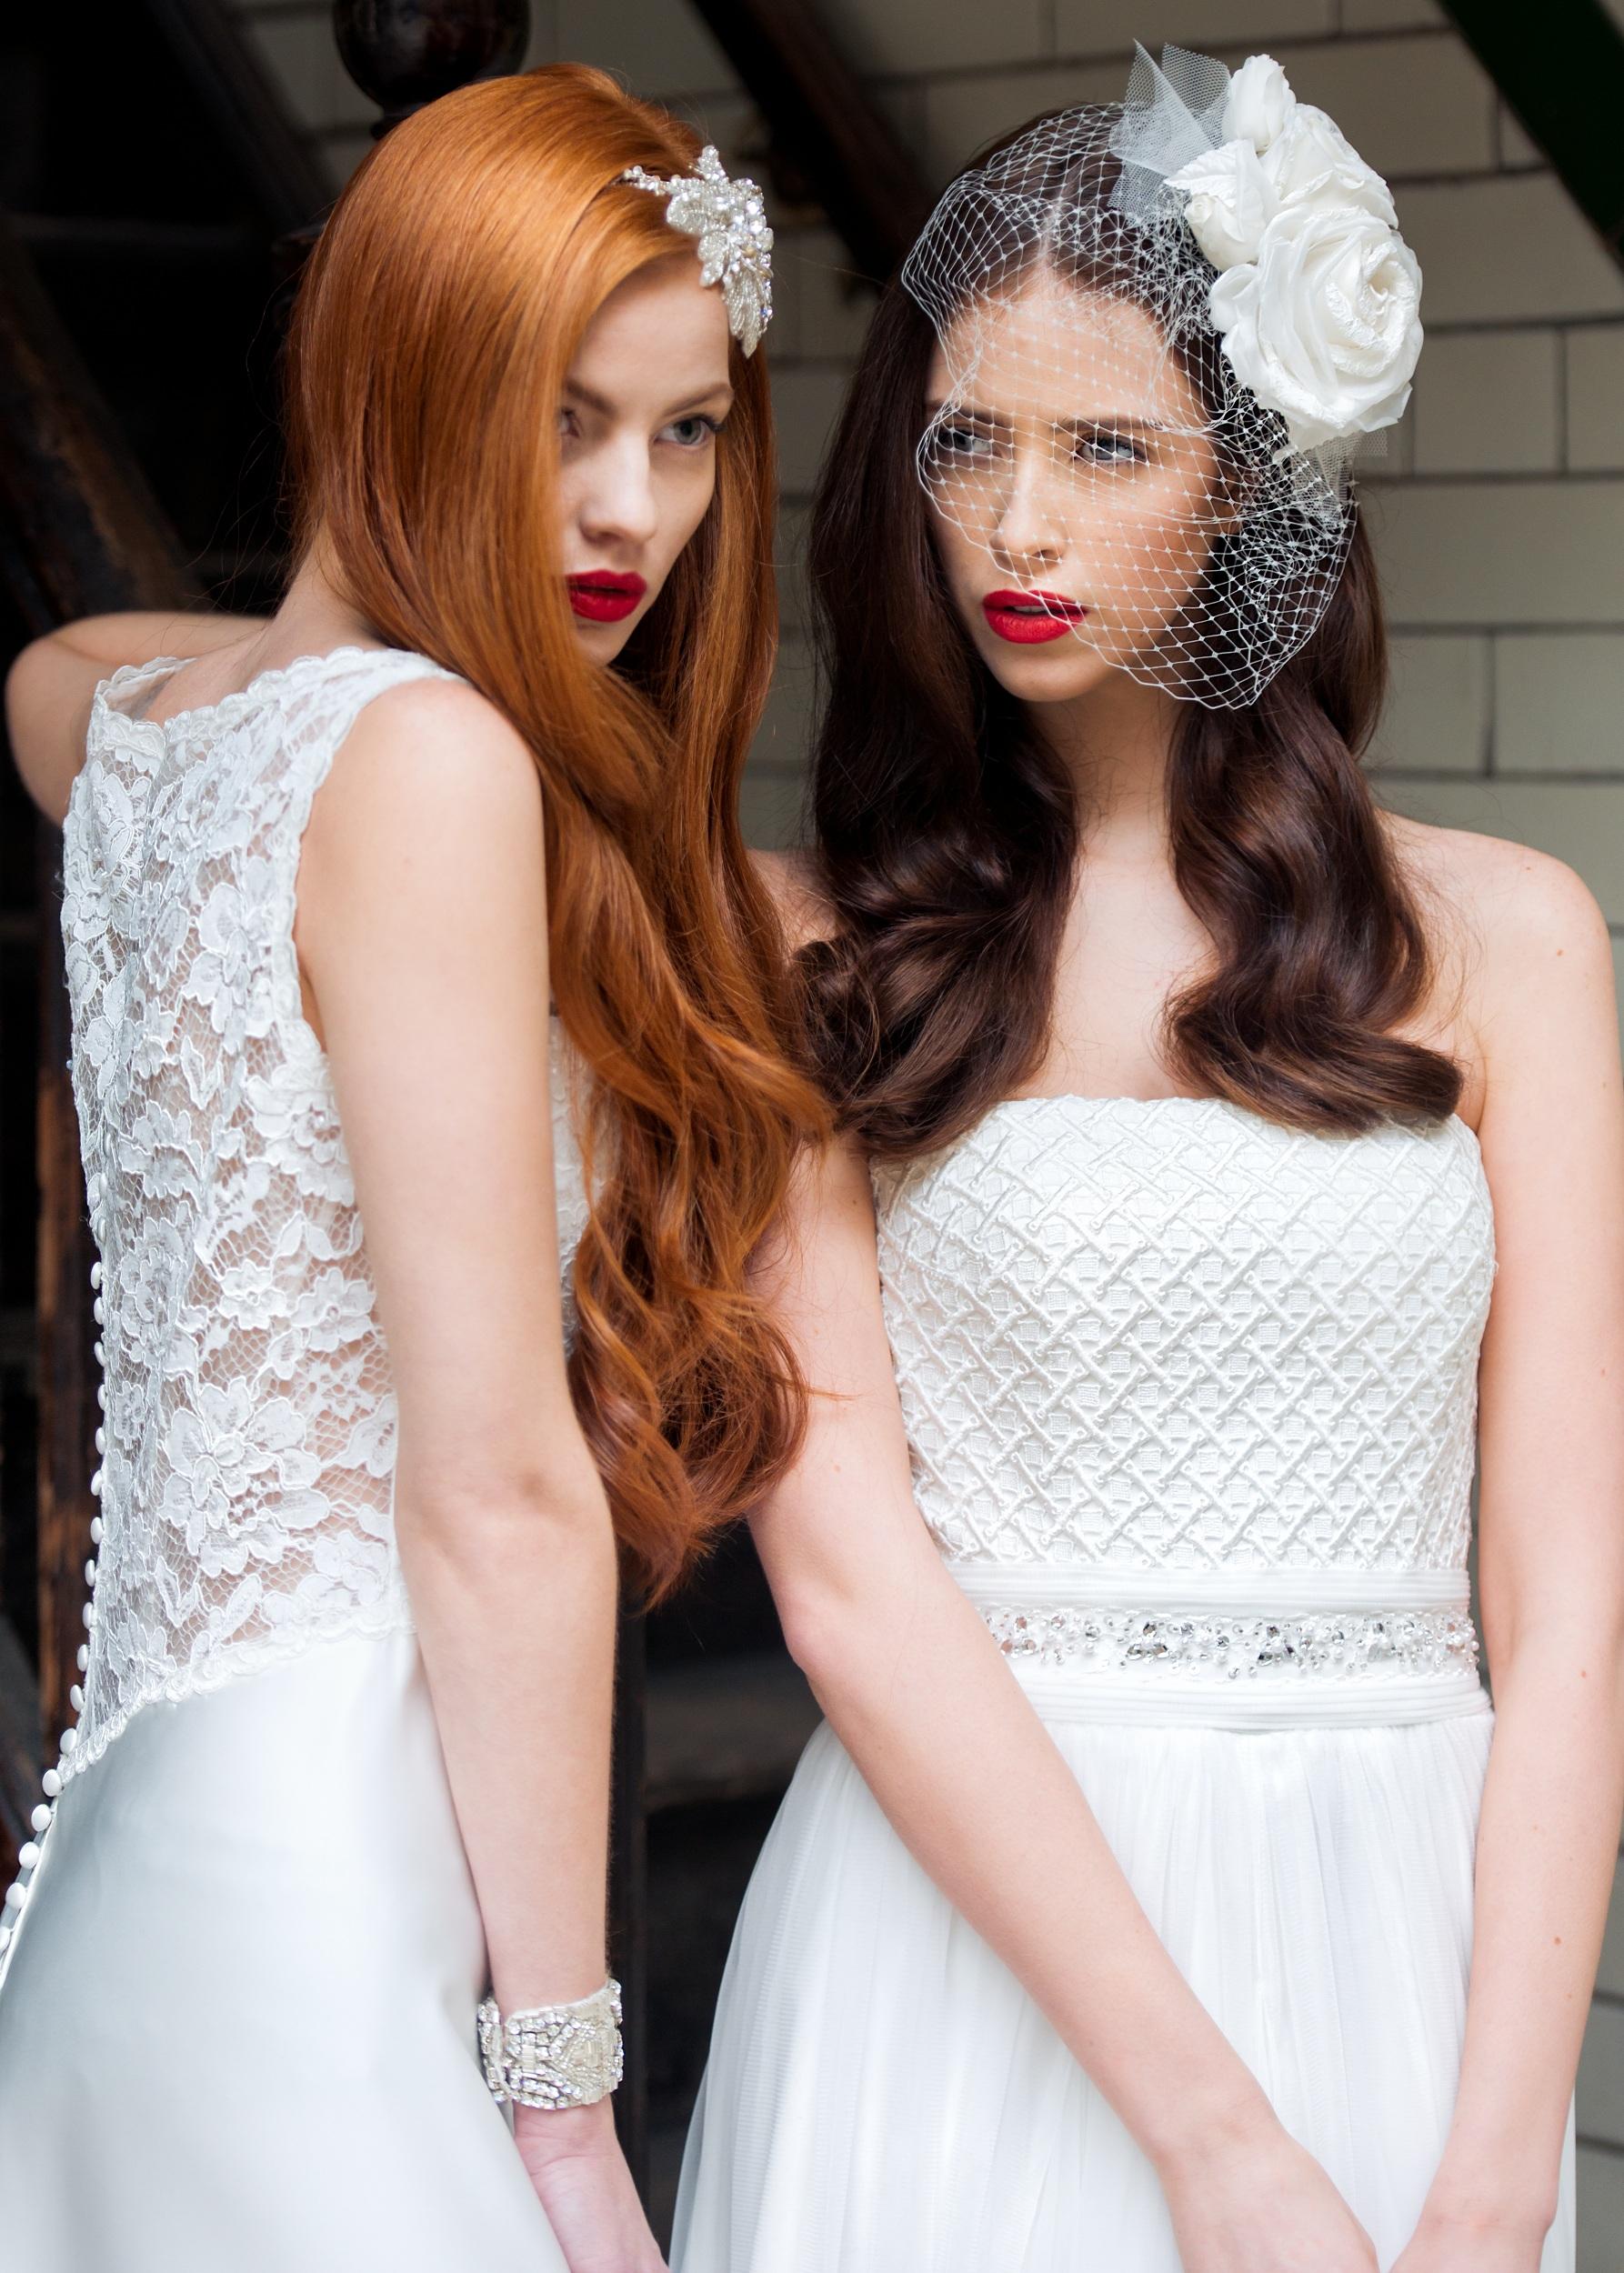 Boadicea and Holly